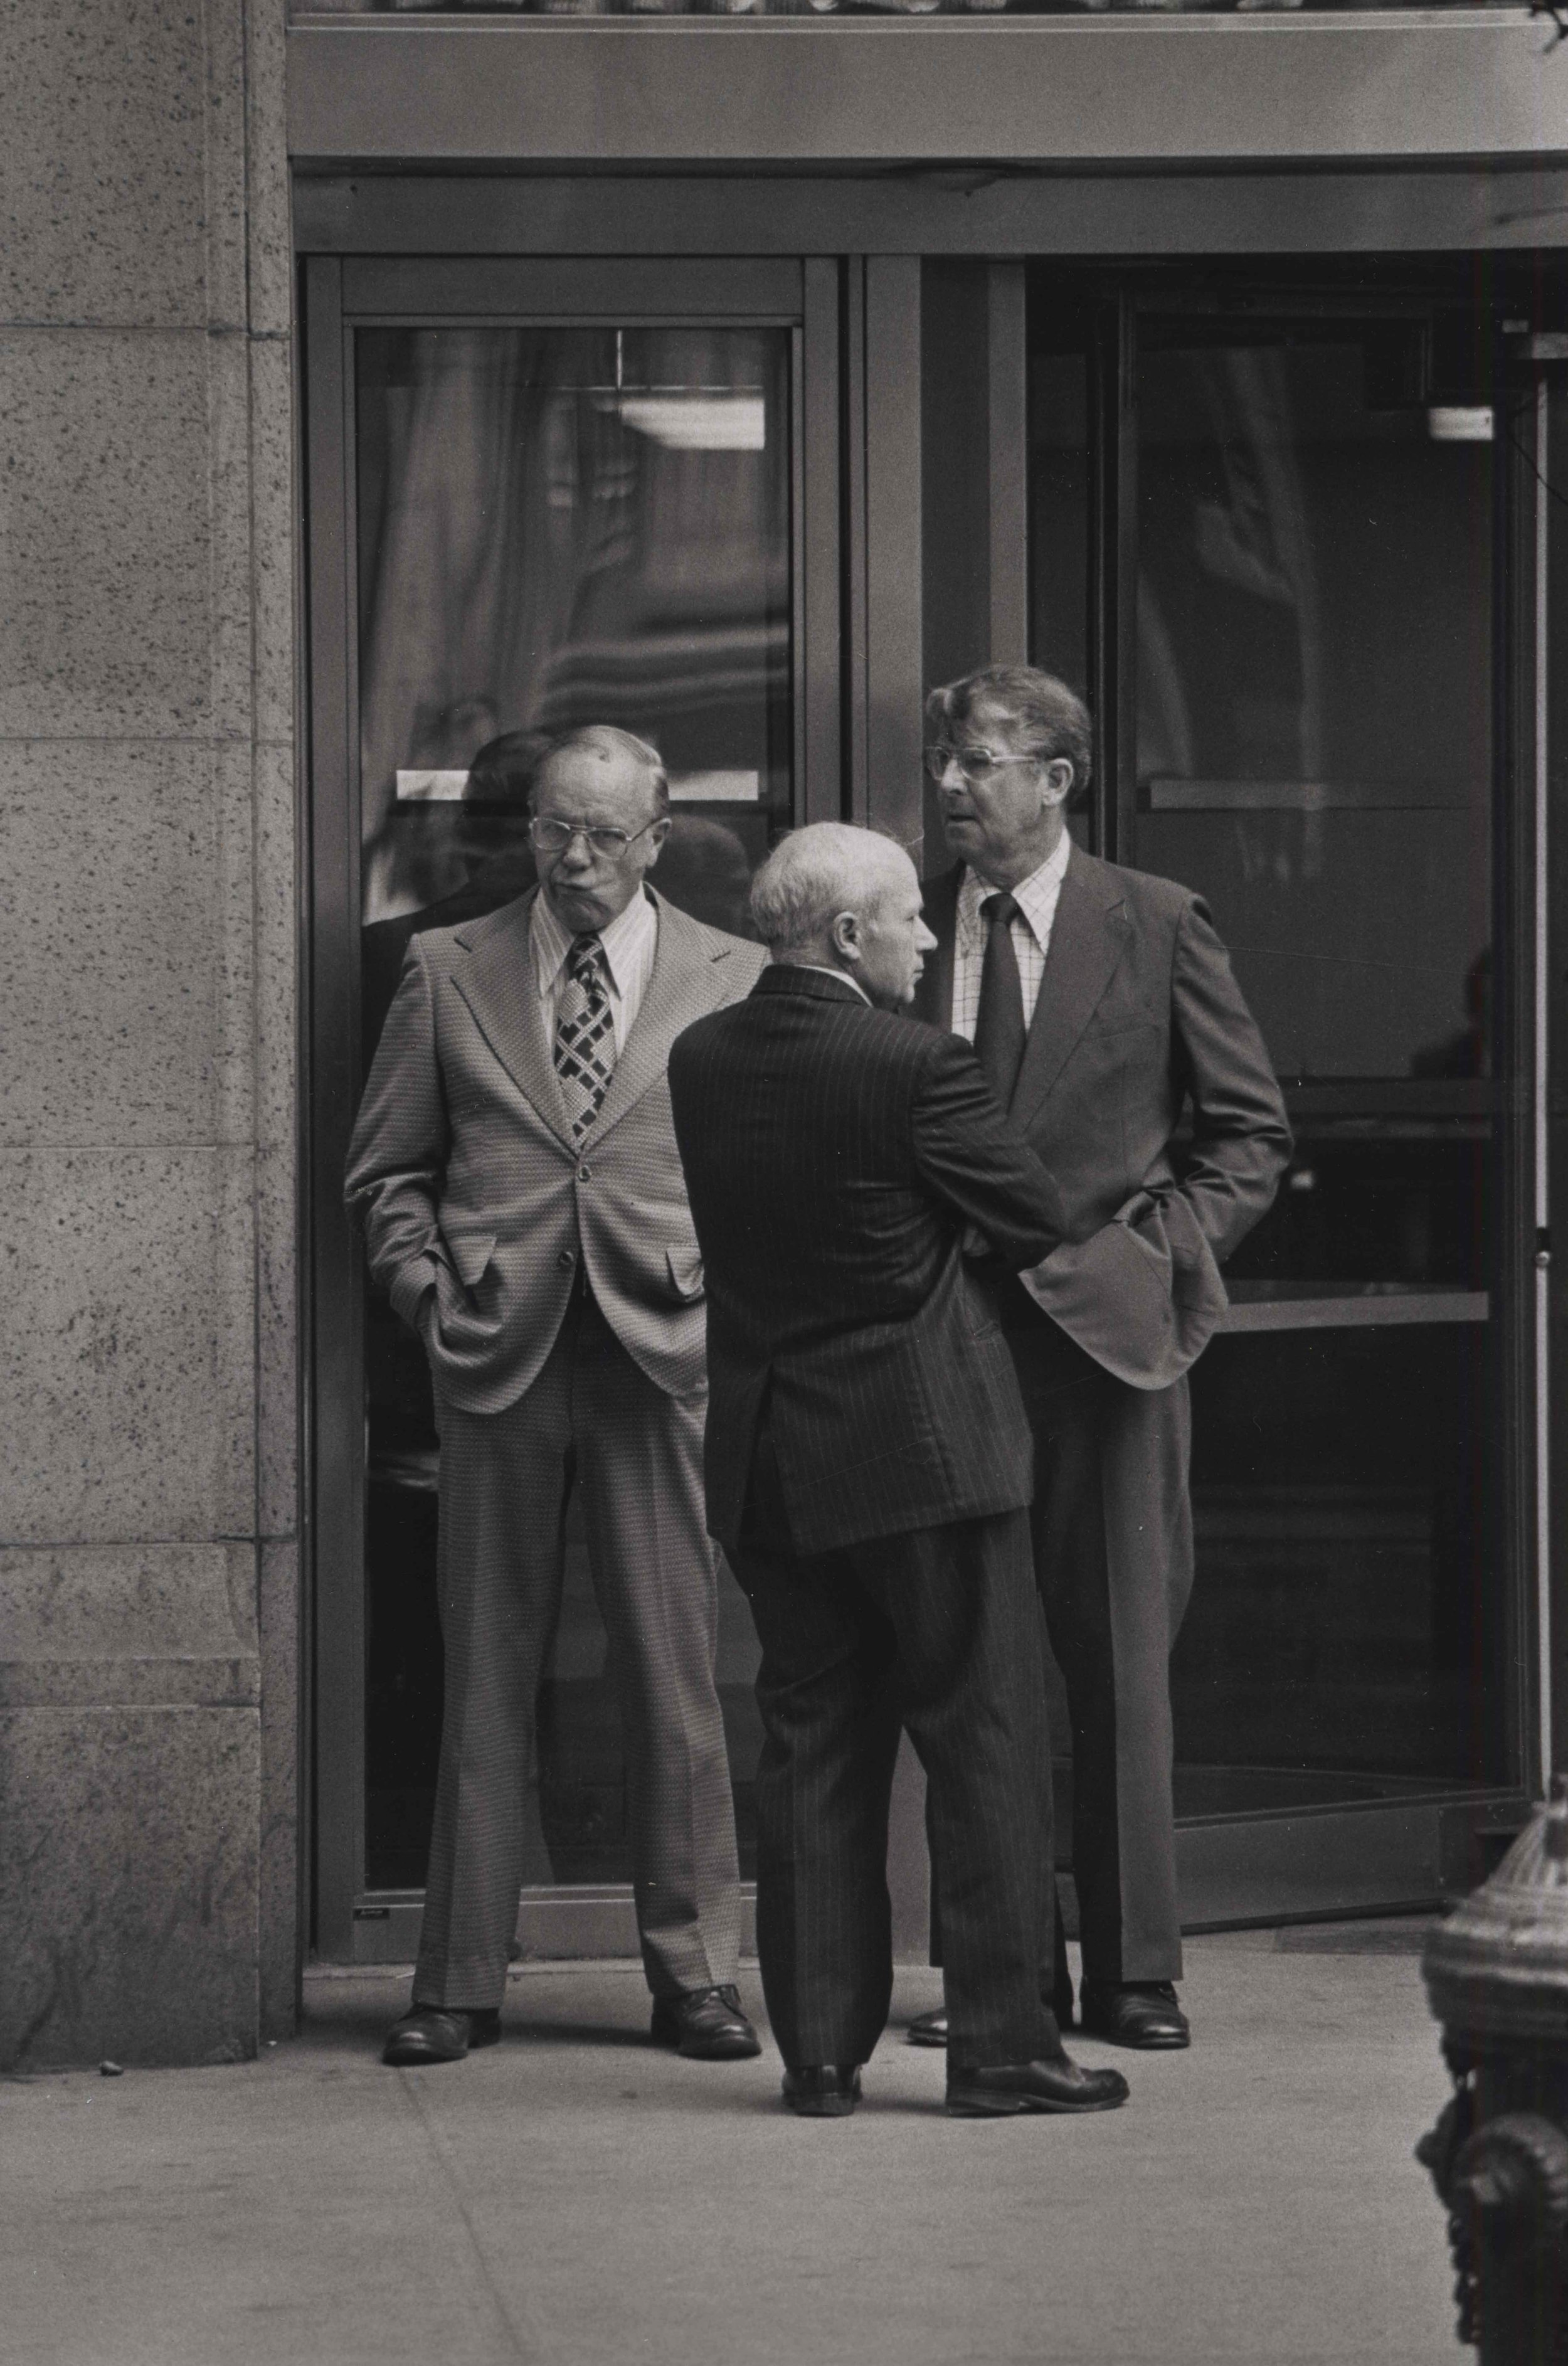 15_85_Three standing men in business suits_Dan Wynn Archive.jpeg